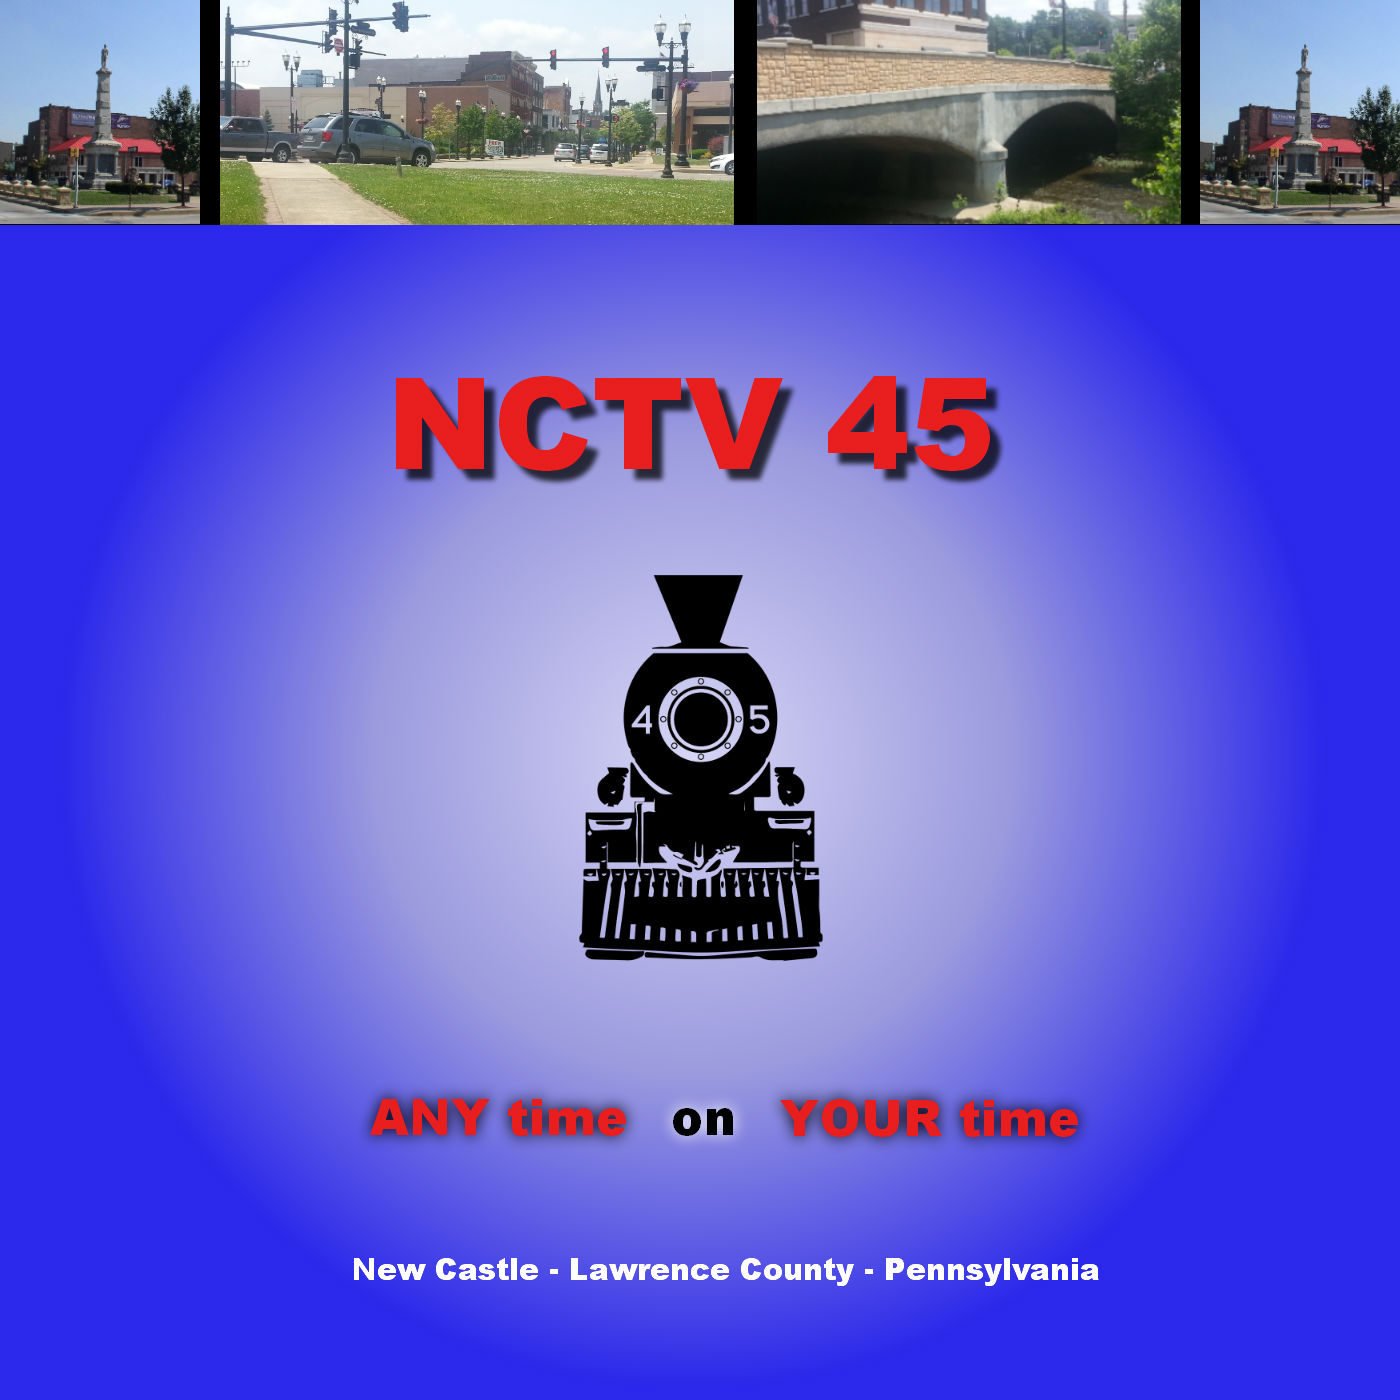 Artwork for NCTV45 Français avec Judy 0034 Summertime in Francais